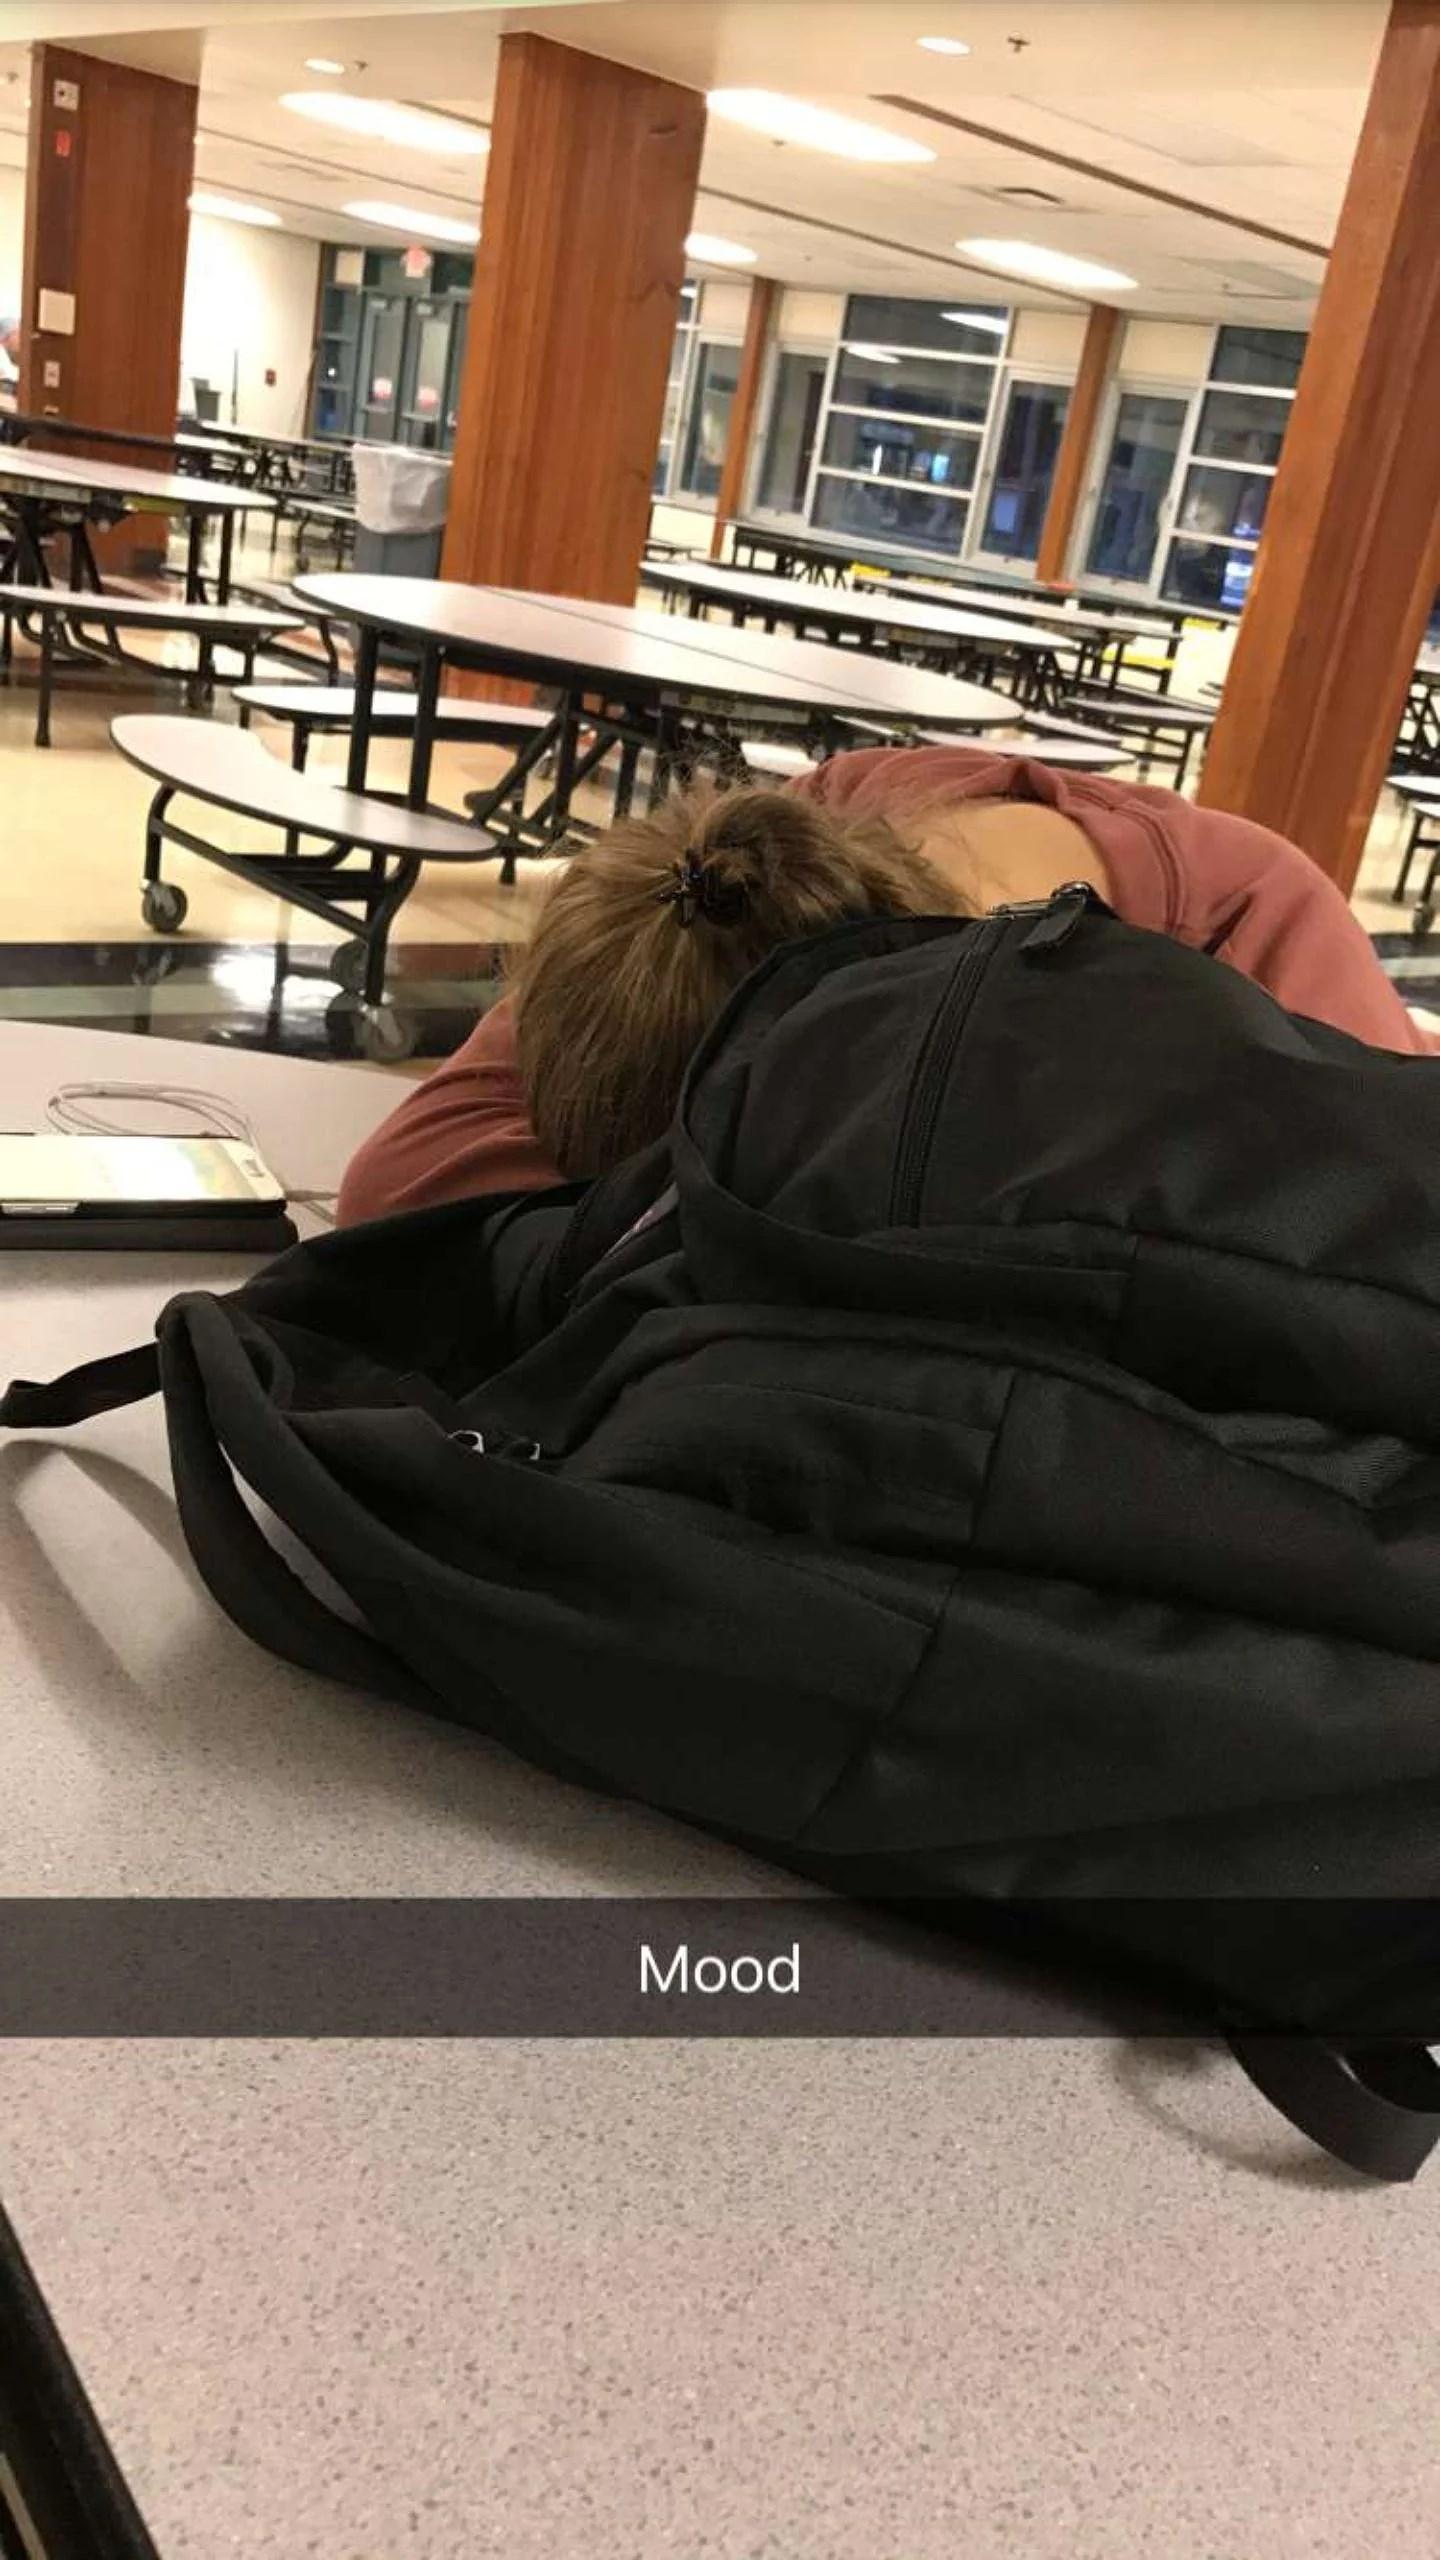 en sämre måndag